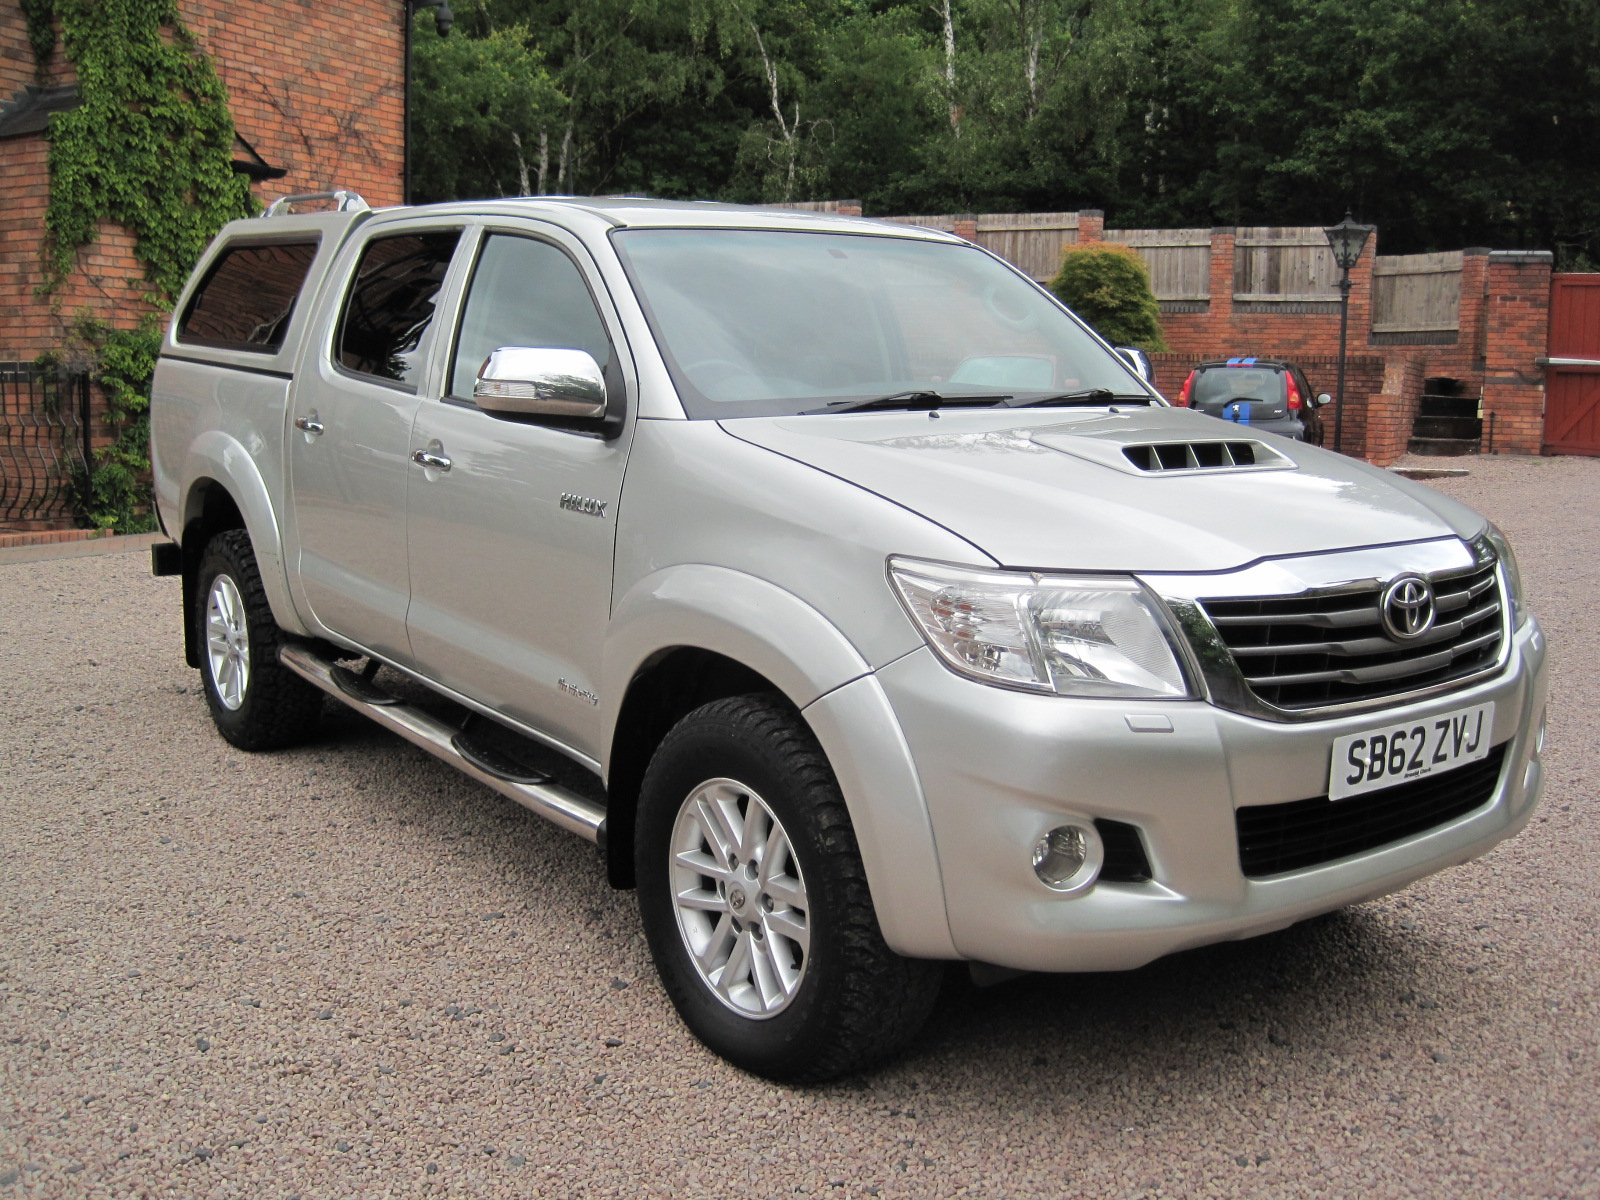 2012 62 Toyota Hilux 3.0 D-4D Invincible Double Cab 4WD 1 Previous Owner! ABSOLUTELY PRISTINE CONDITION! PLUS VAT!